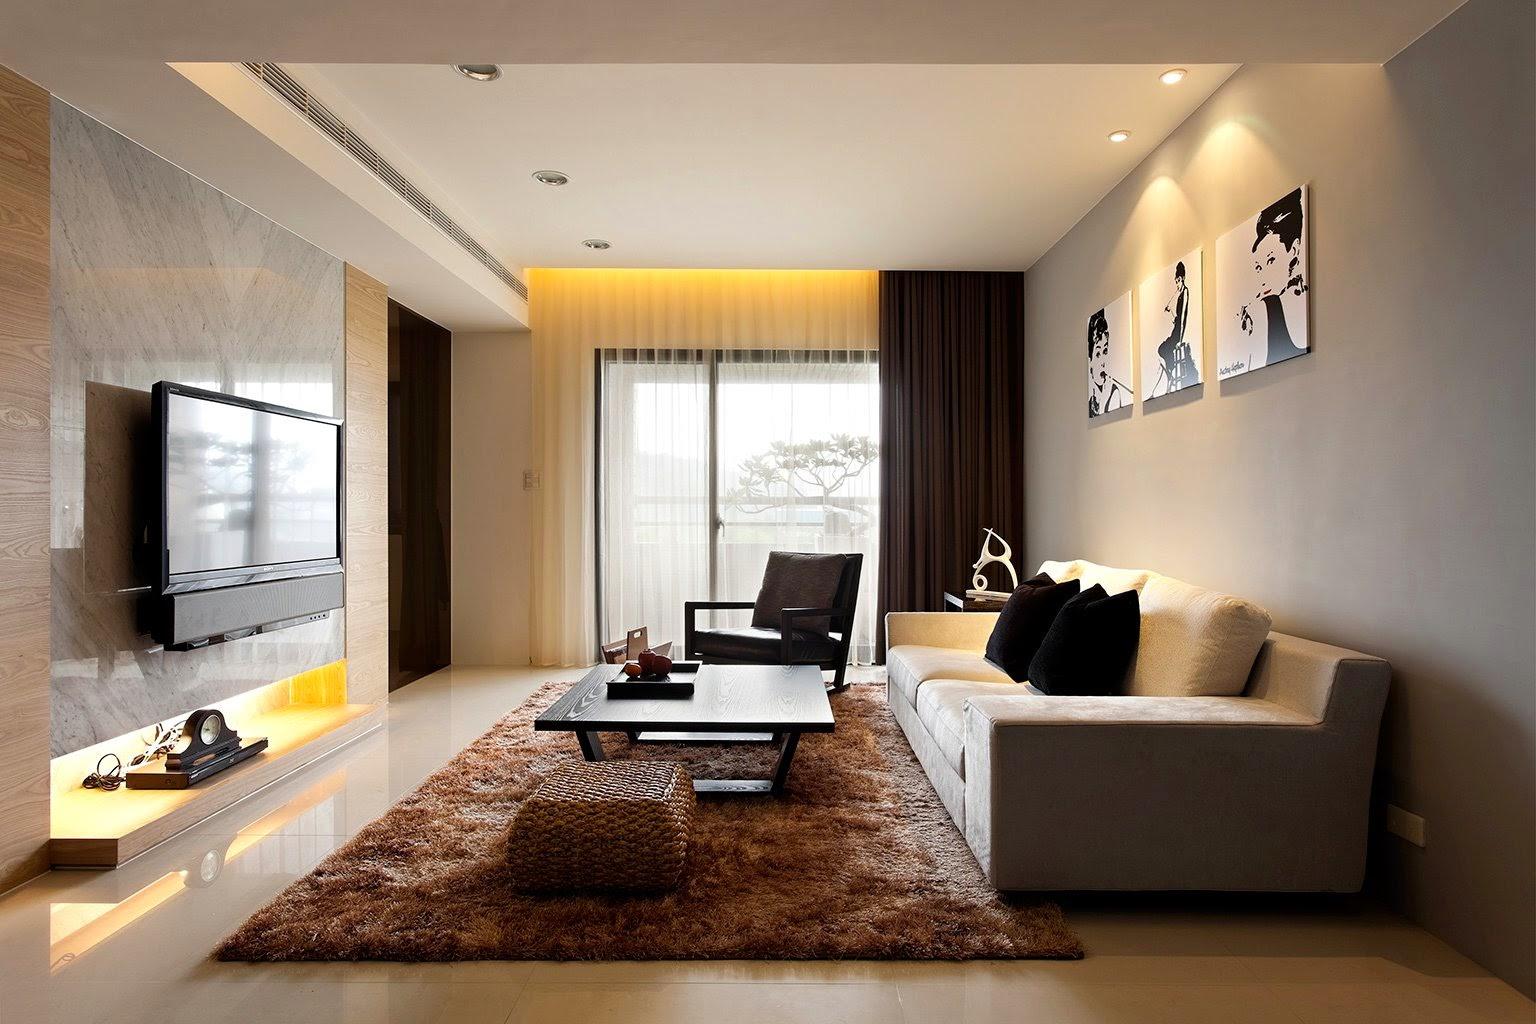 minimalist home design decor minimalist homes modern small living room 2015 - Minimalist Home Designs